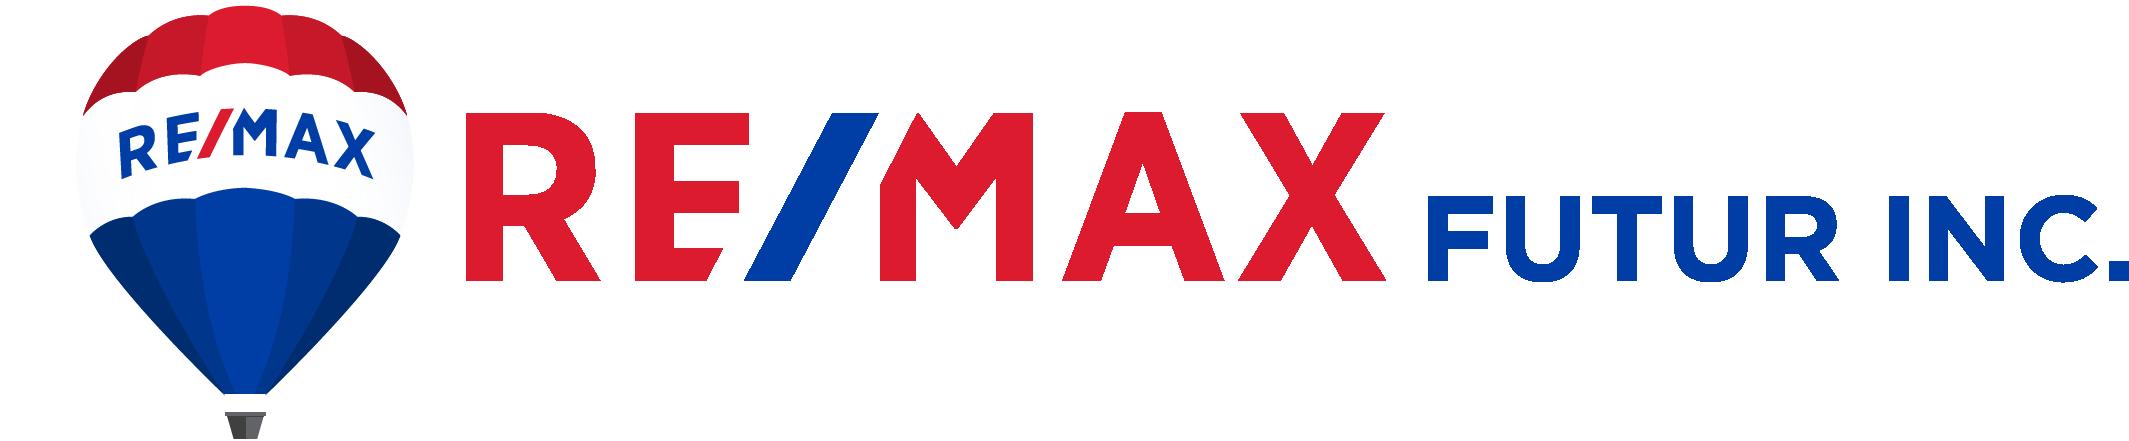 RE/MAX Futur